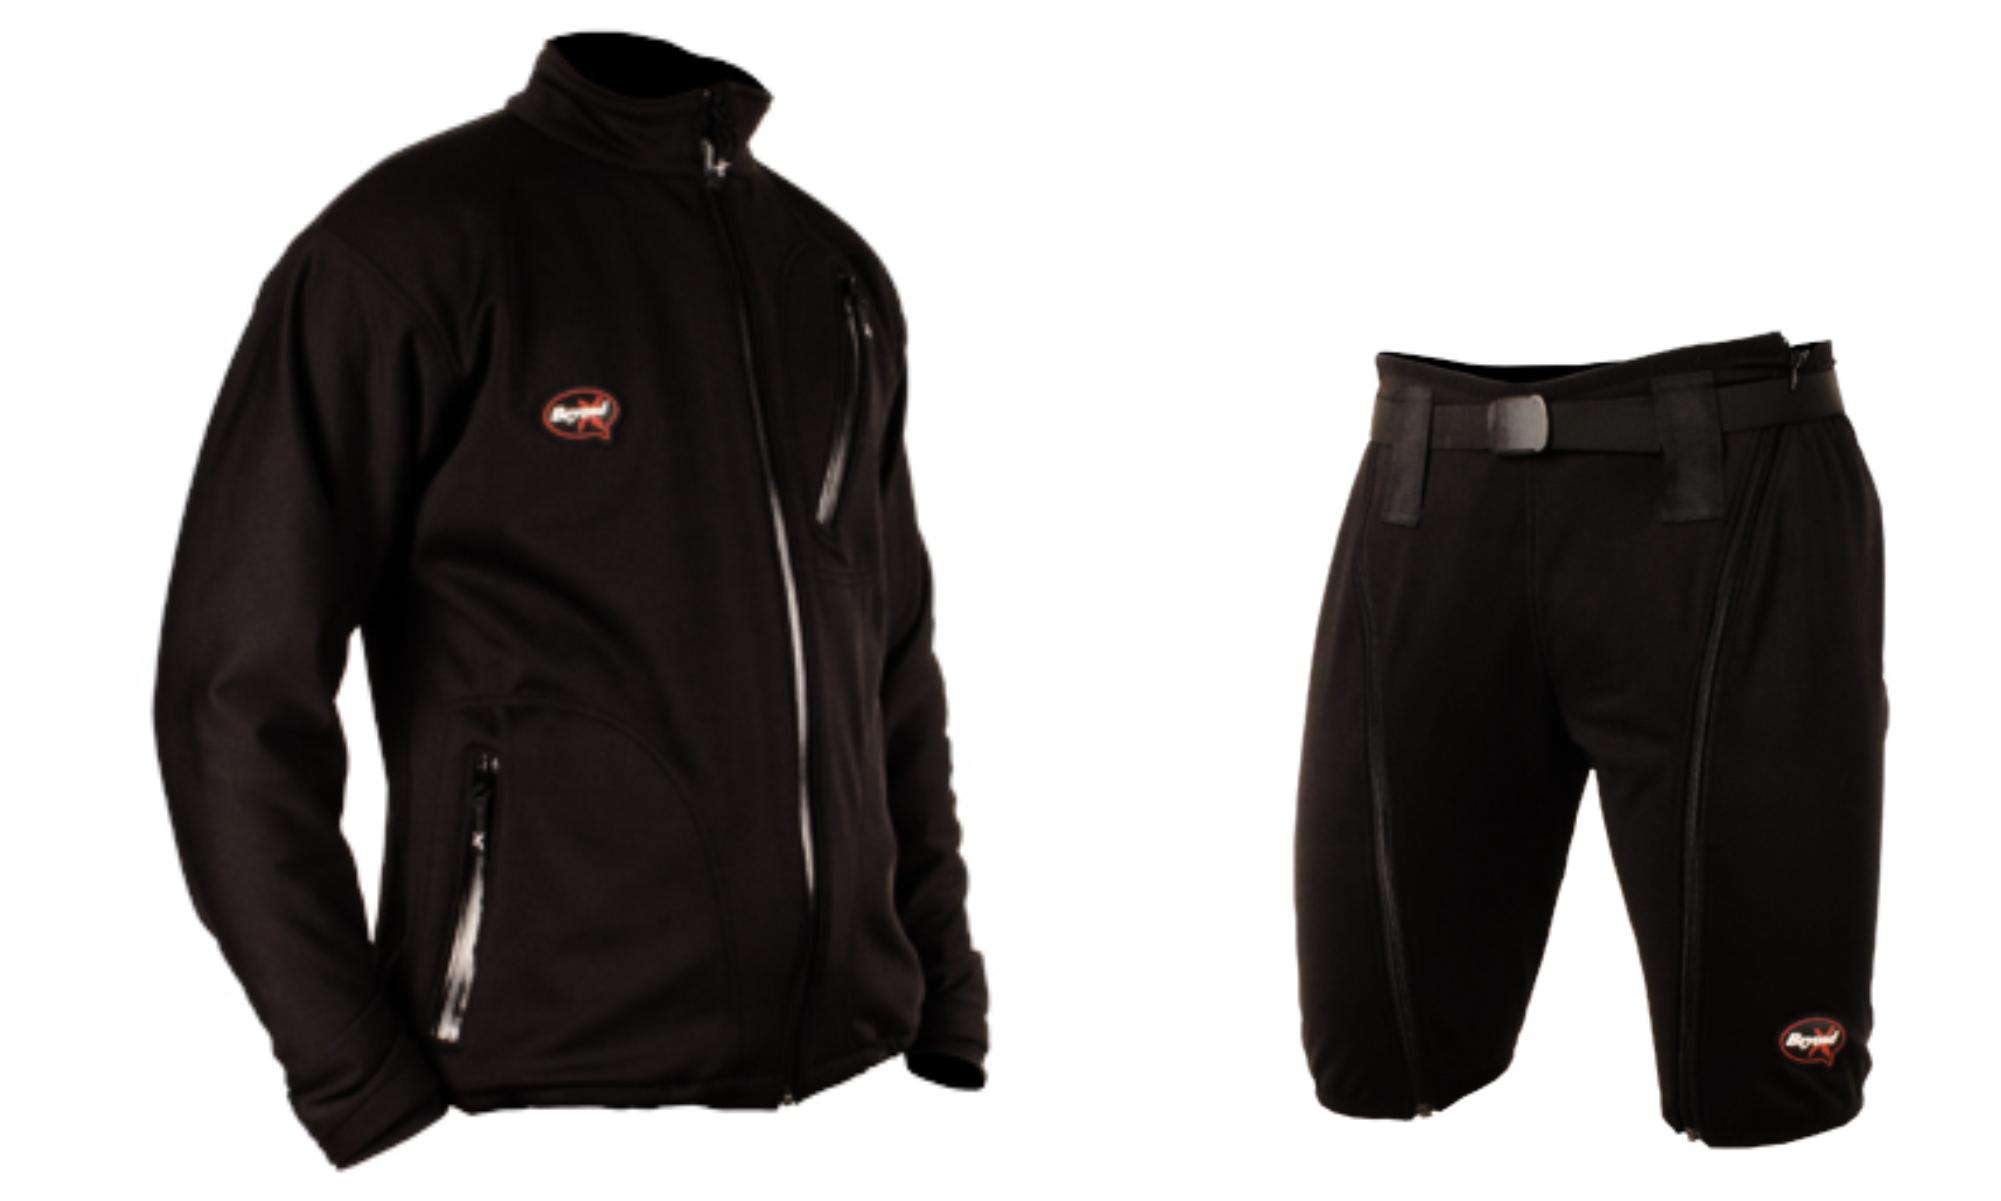 Race & Traning Garments